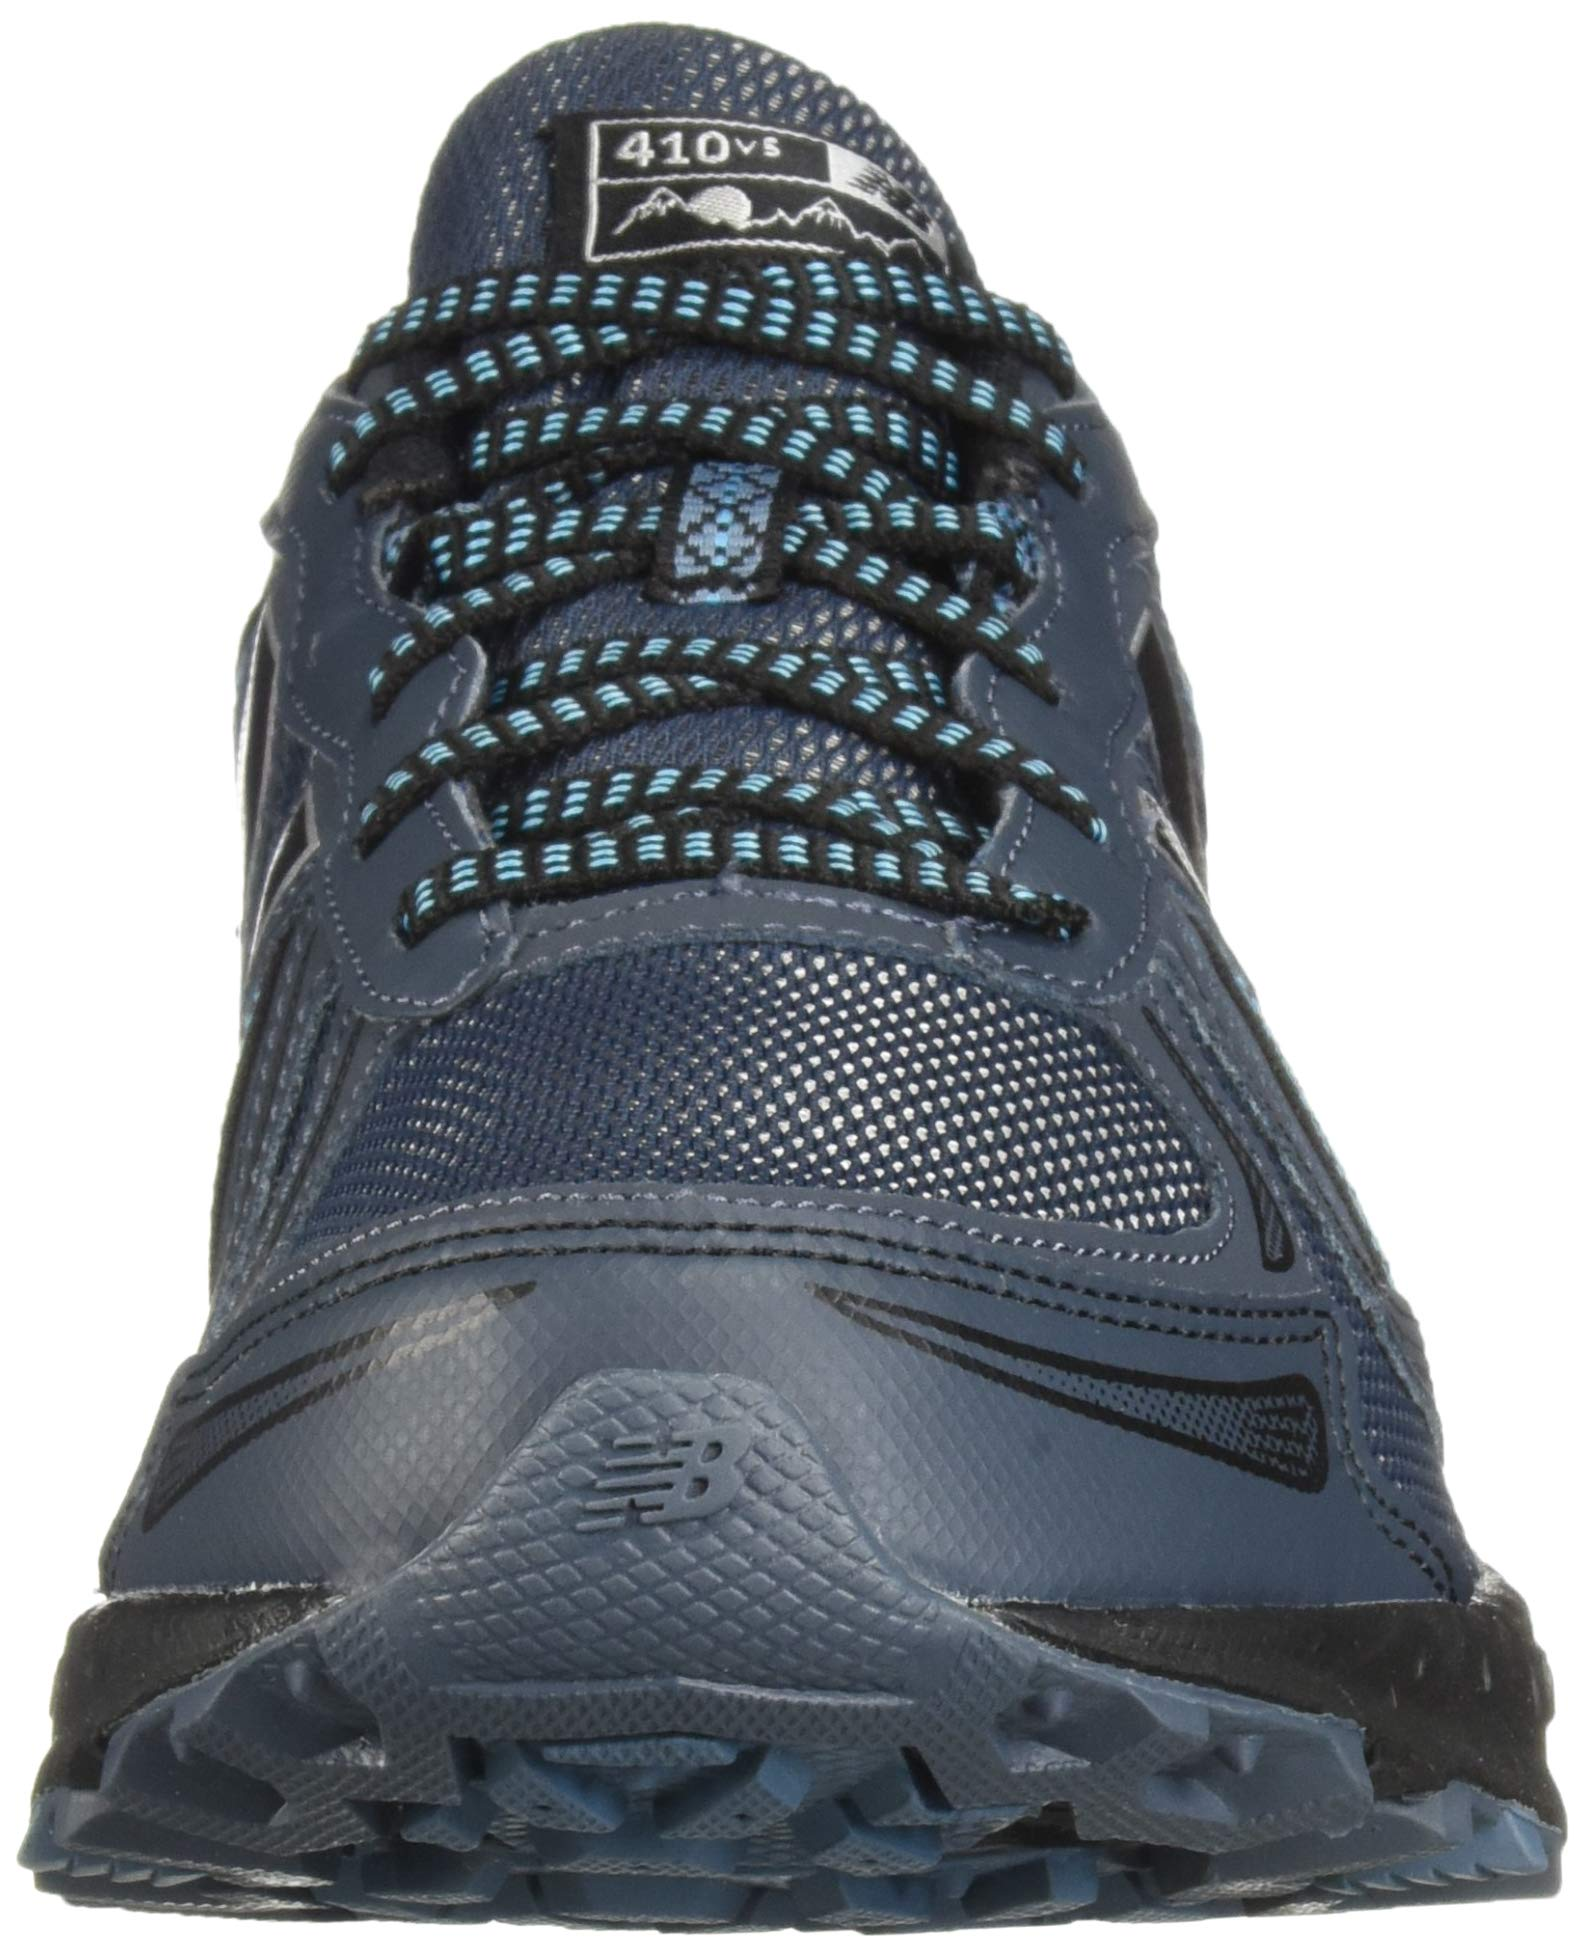 New Balance Men's 410v5 Cushioning Trail Running Shoe, Petrol/Cadet/Black, 7 D US by New Balance (Image #4)